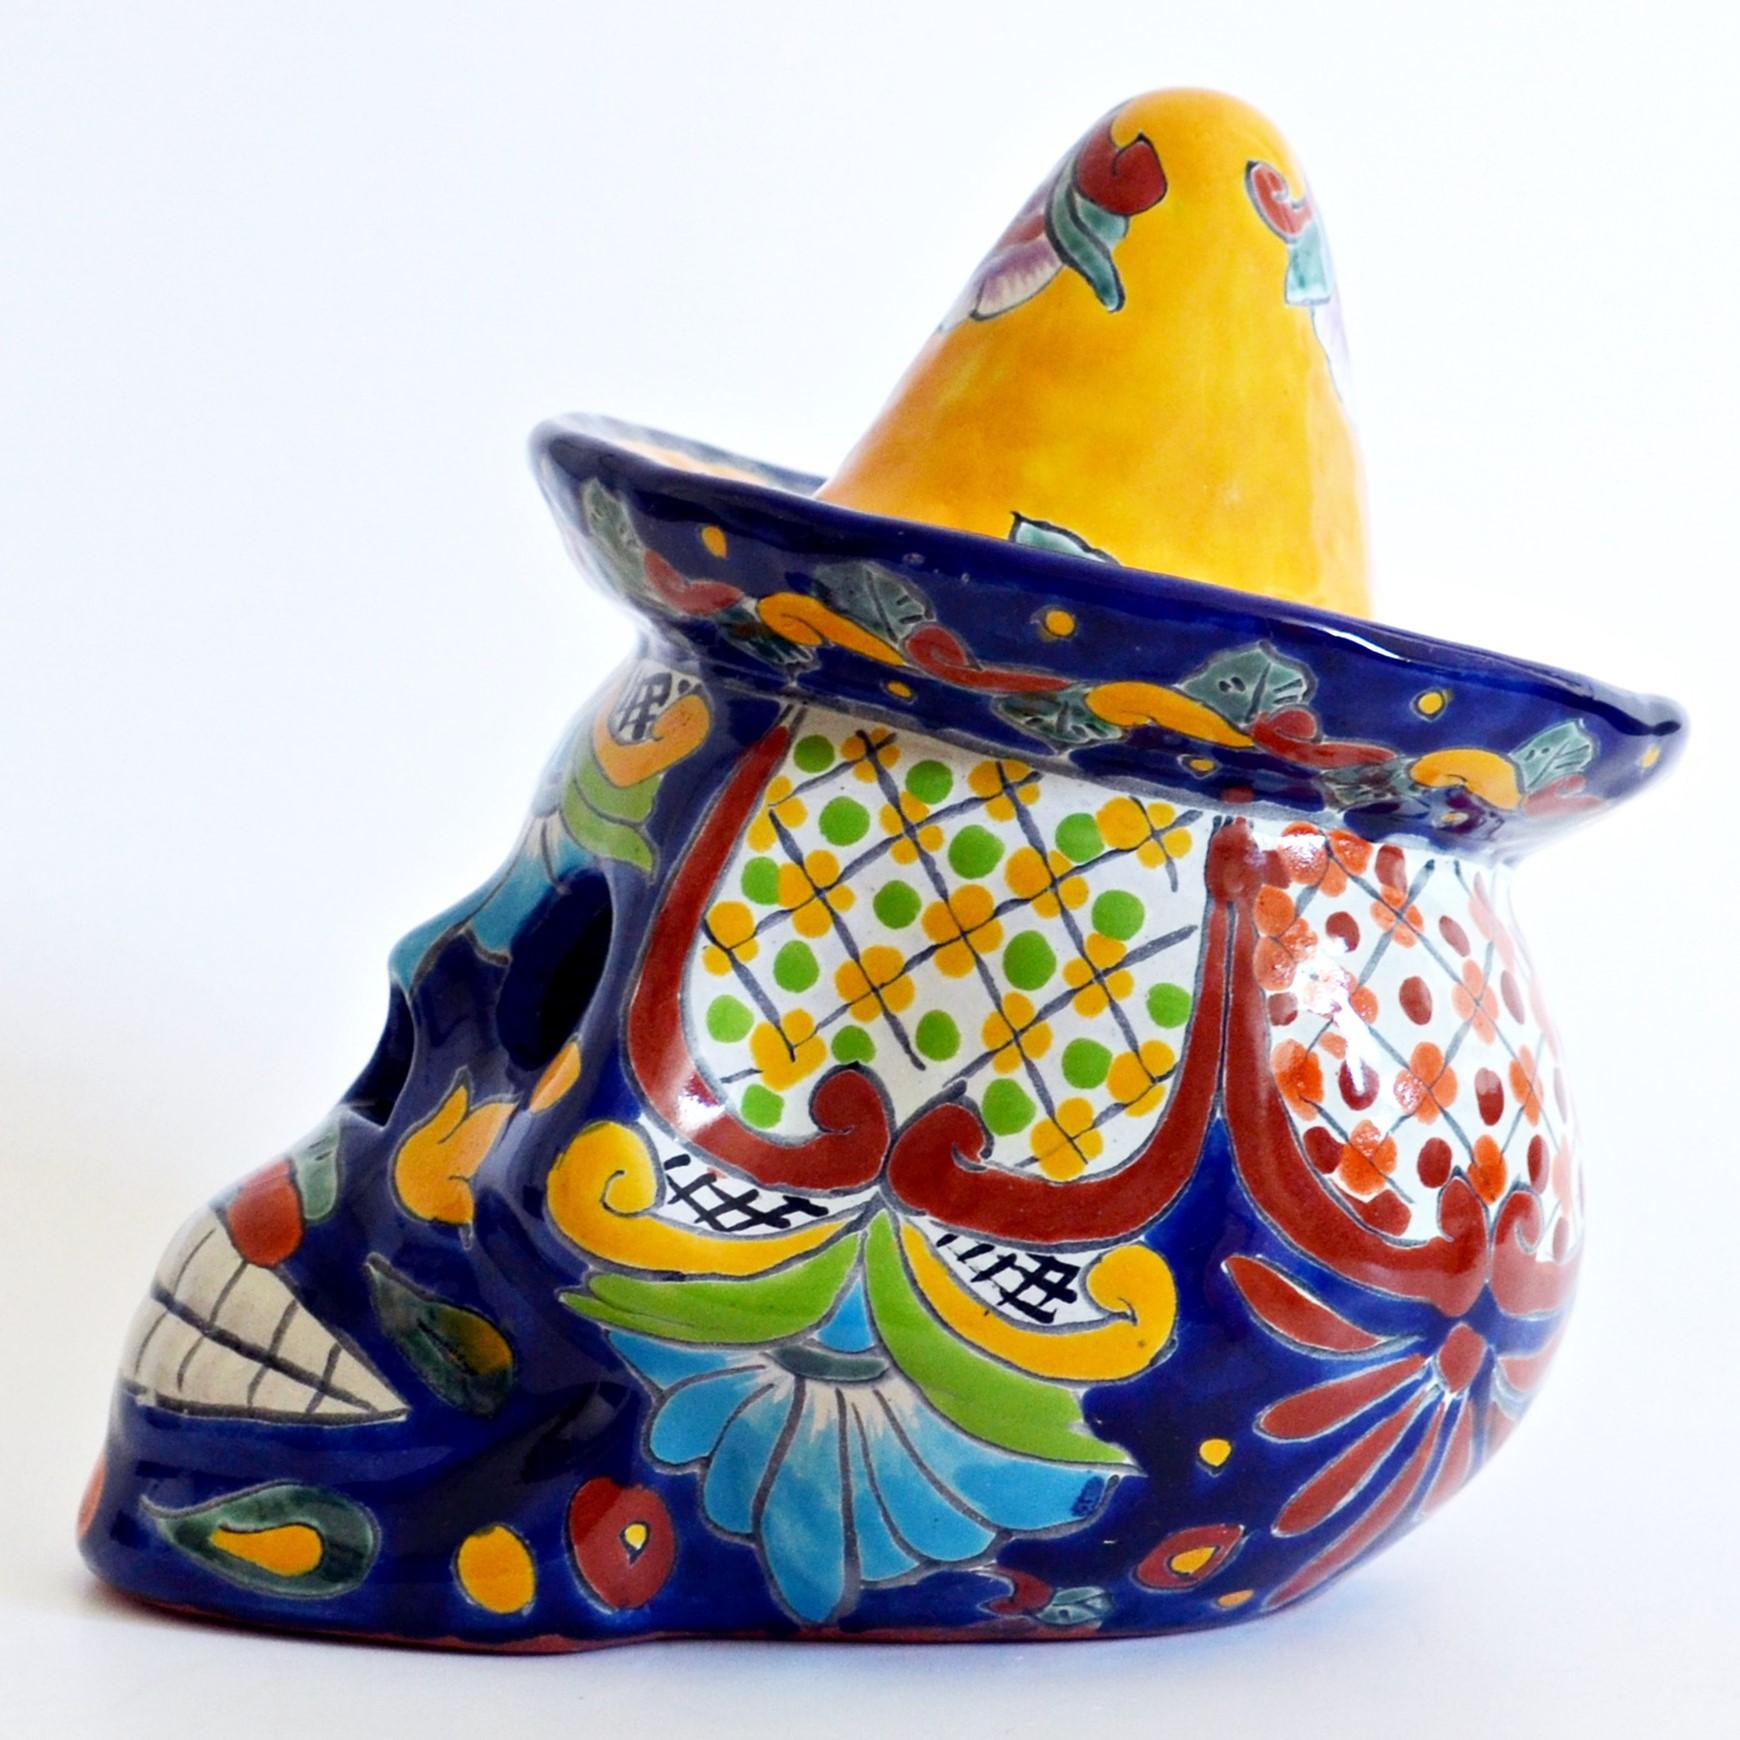 Mexikanischer Totenkopf aus Keramik